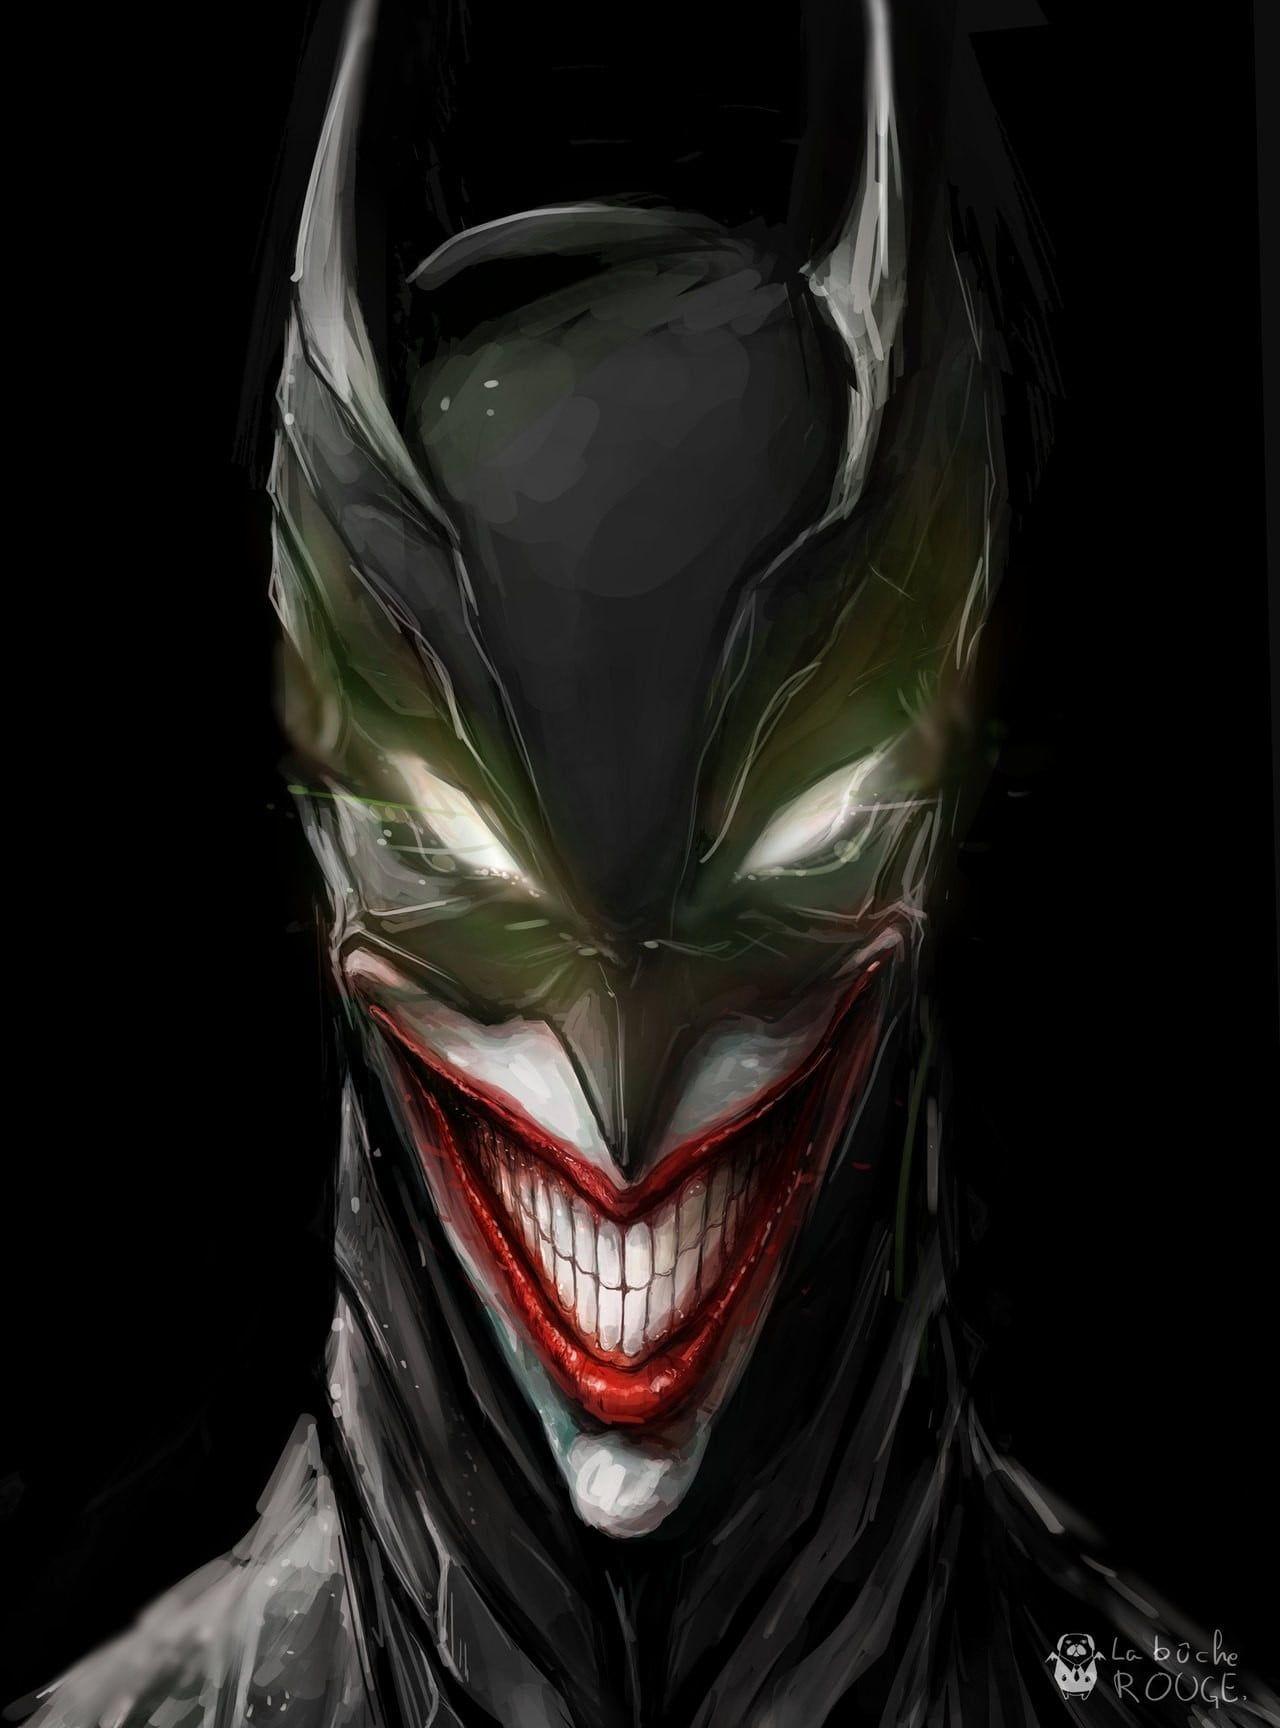 Marvel Batman Joker Wallpaper Batman Joker 720p Wallpaper Hdwallpaper Desktop Batman Joker Wallpaper Batman Joker Joker Wallpaper